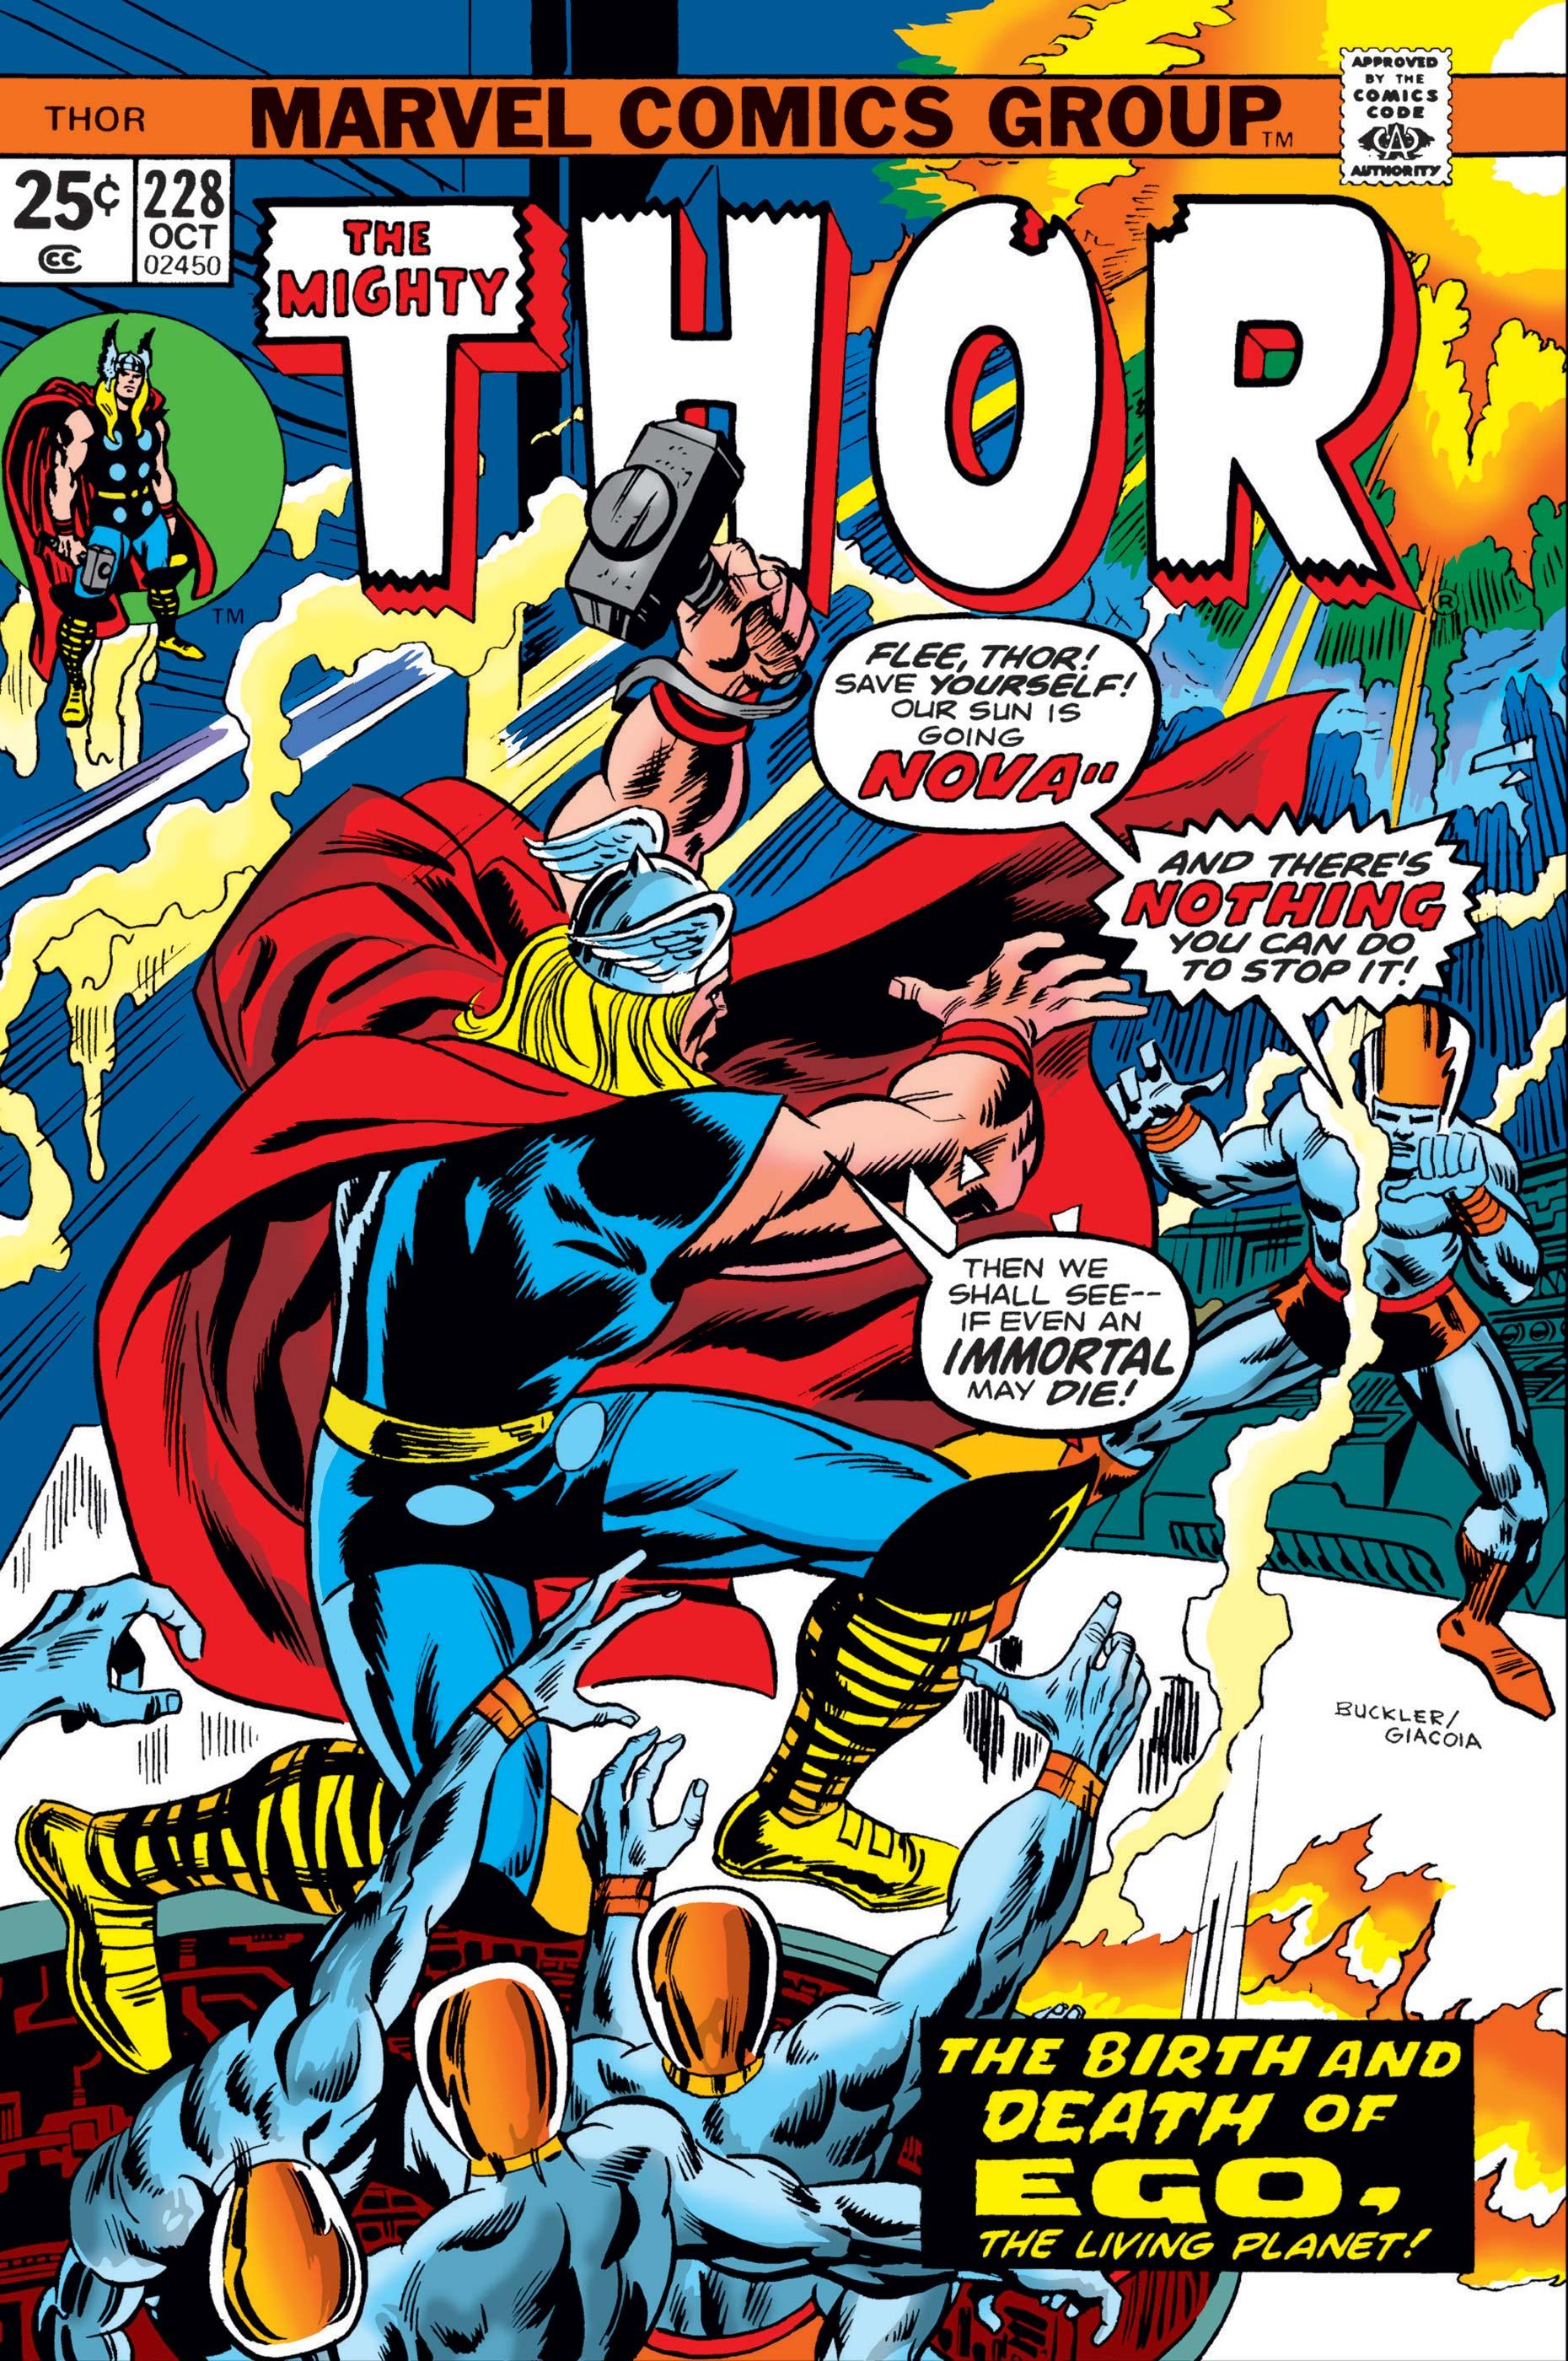 Thor (1966) #228